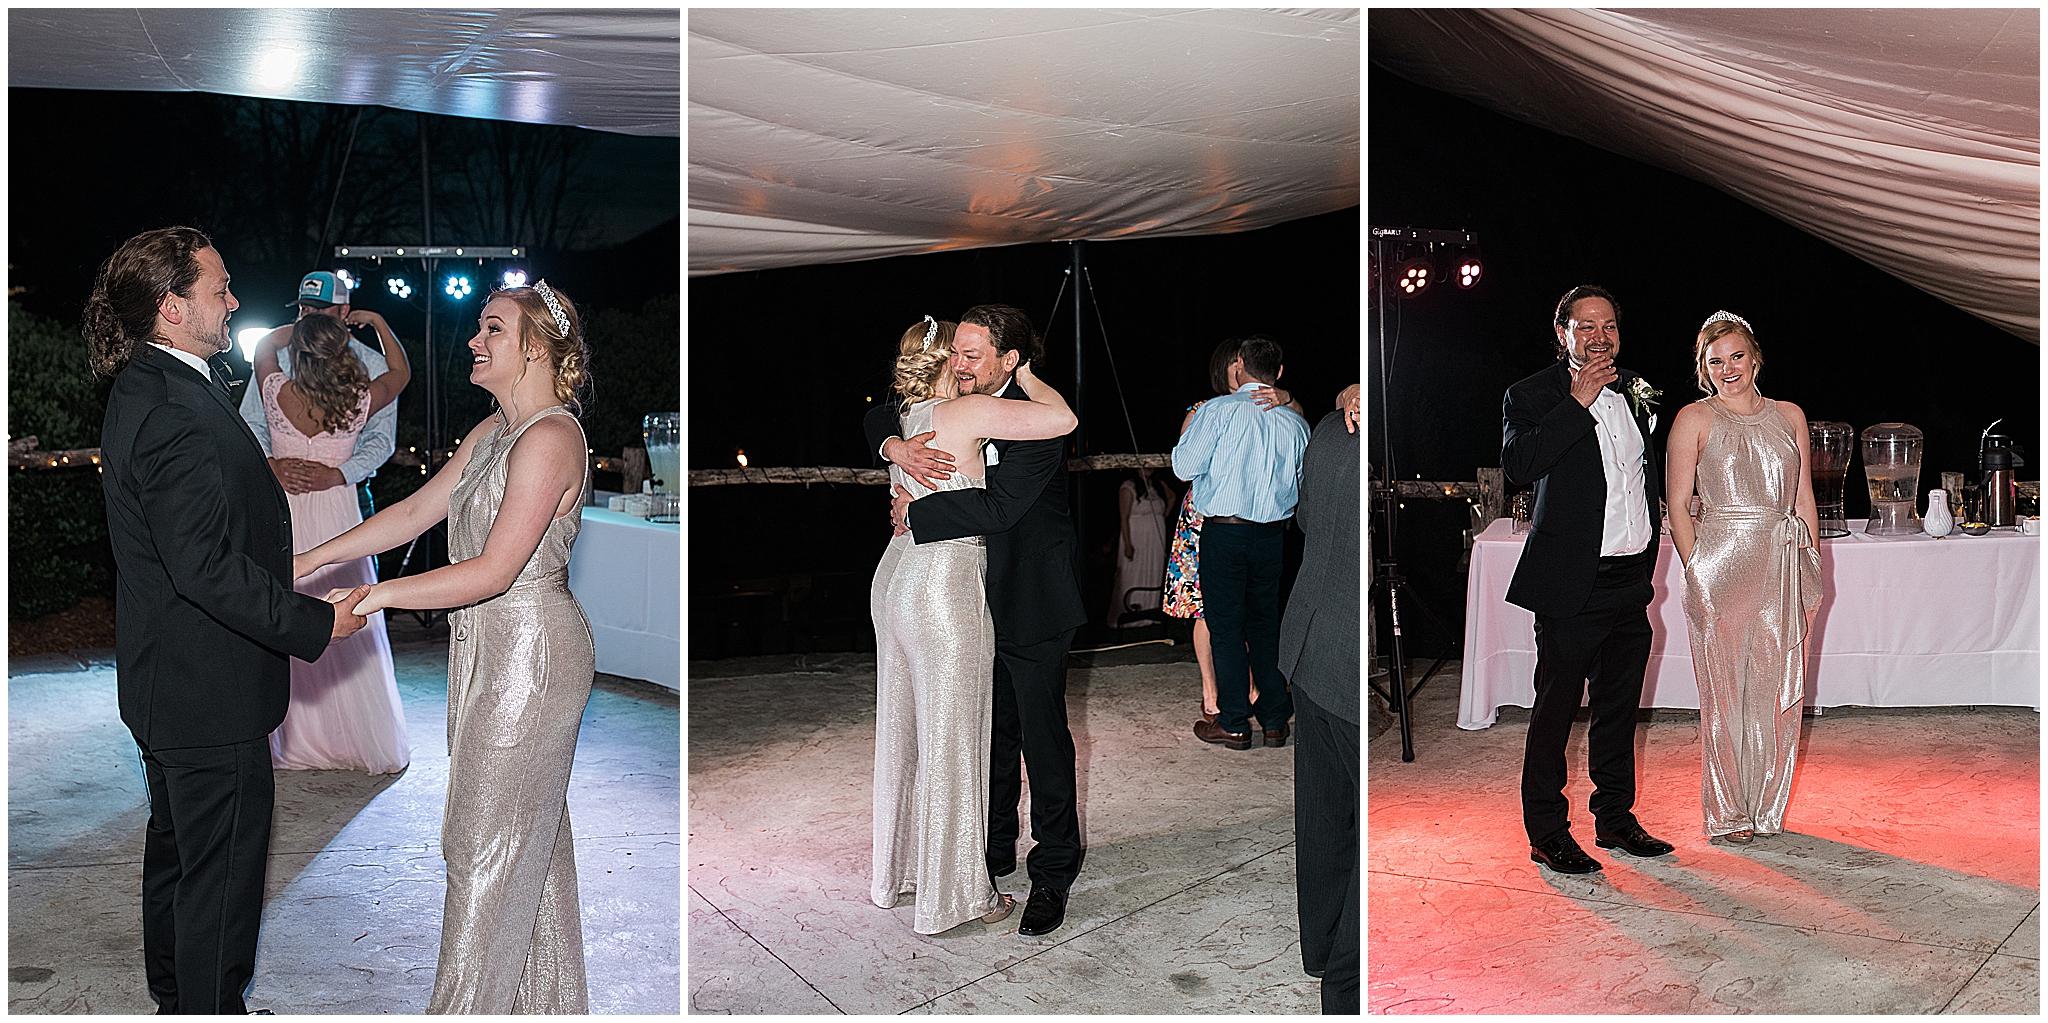 Wedding_Photographers_Asheville_Mountain_Magnolia_Inn_0027.jpg